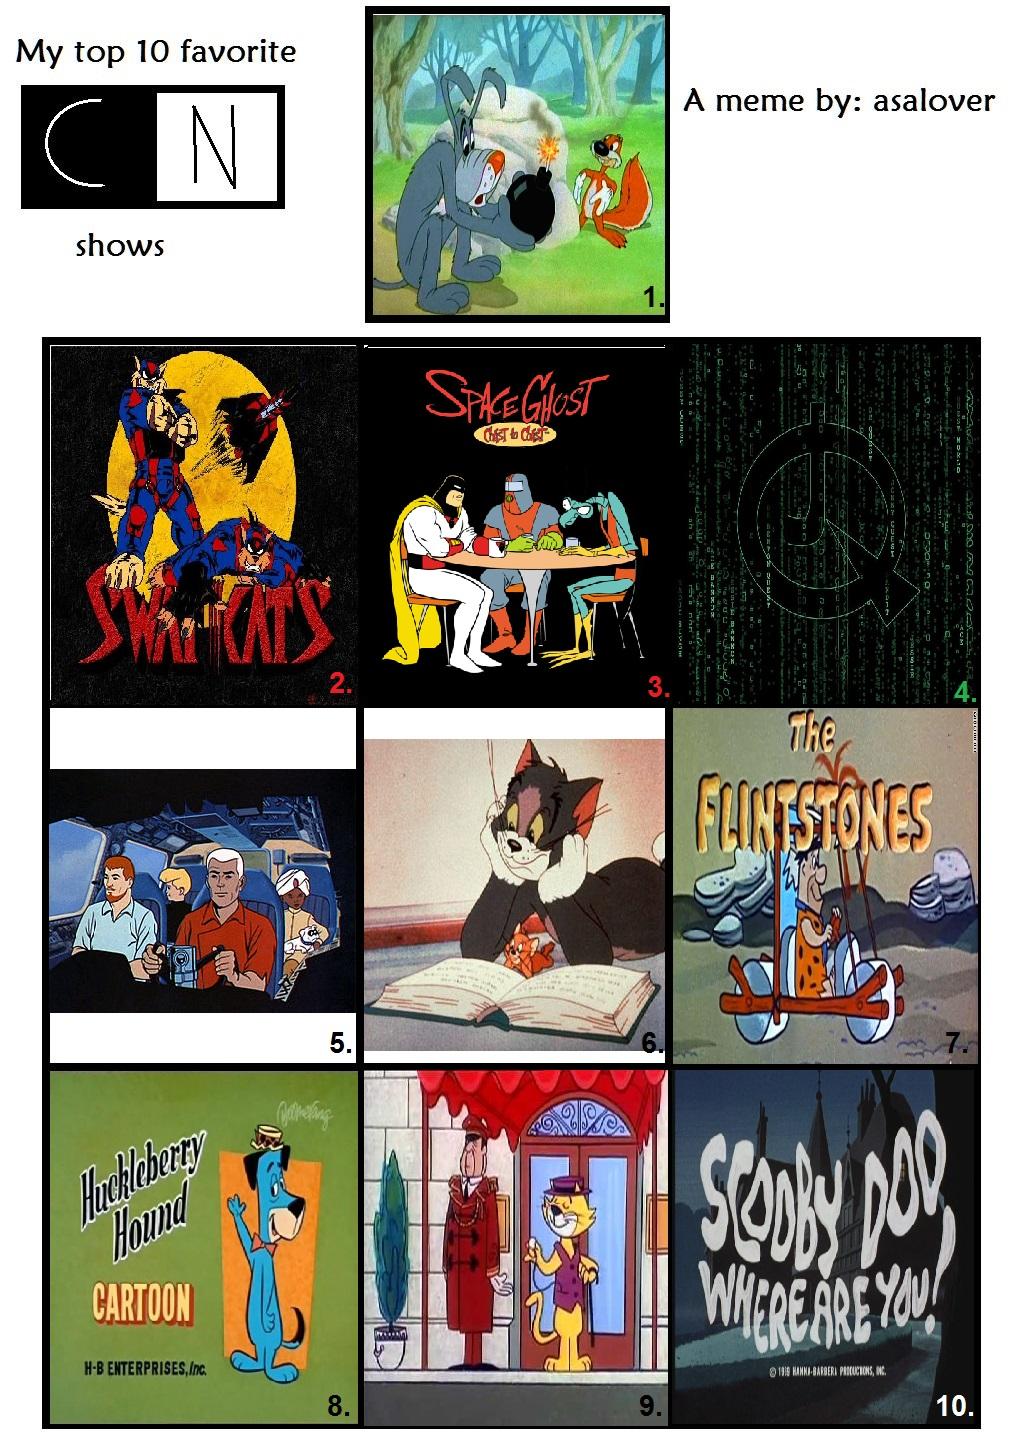 My Top 10 Cartoon Network shows by JimmyTwoTimes2K9 on DeviantArt